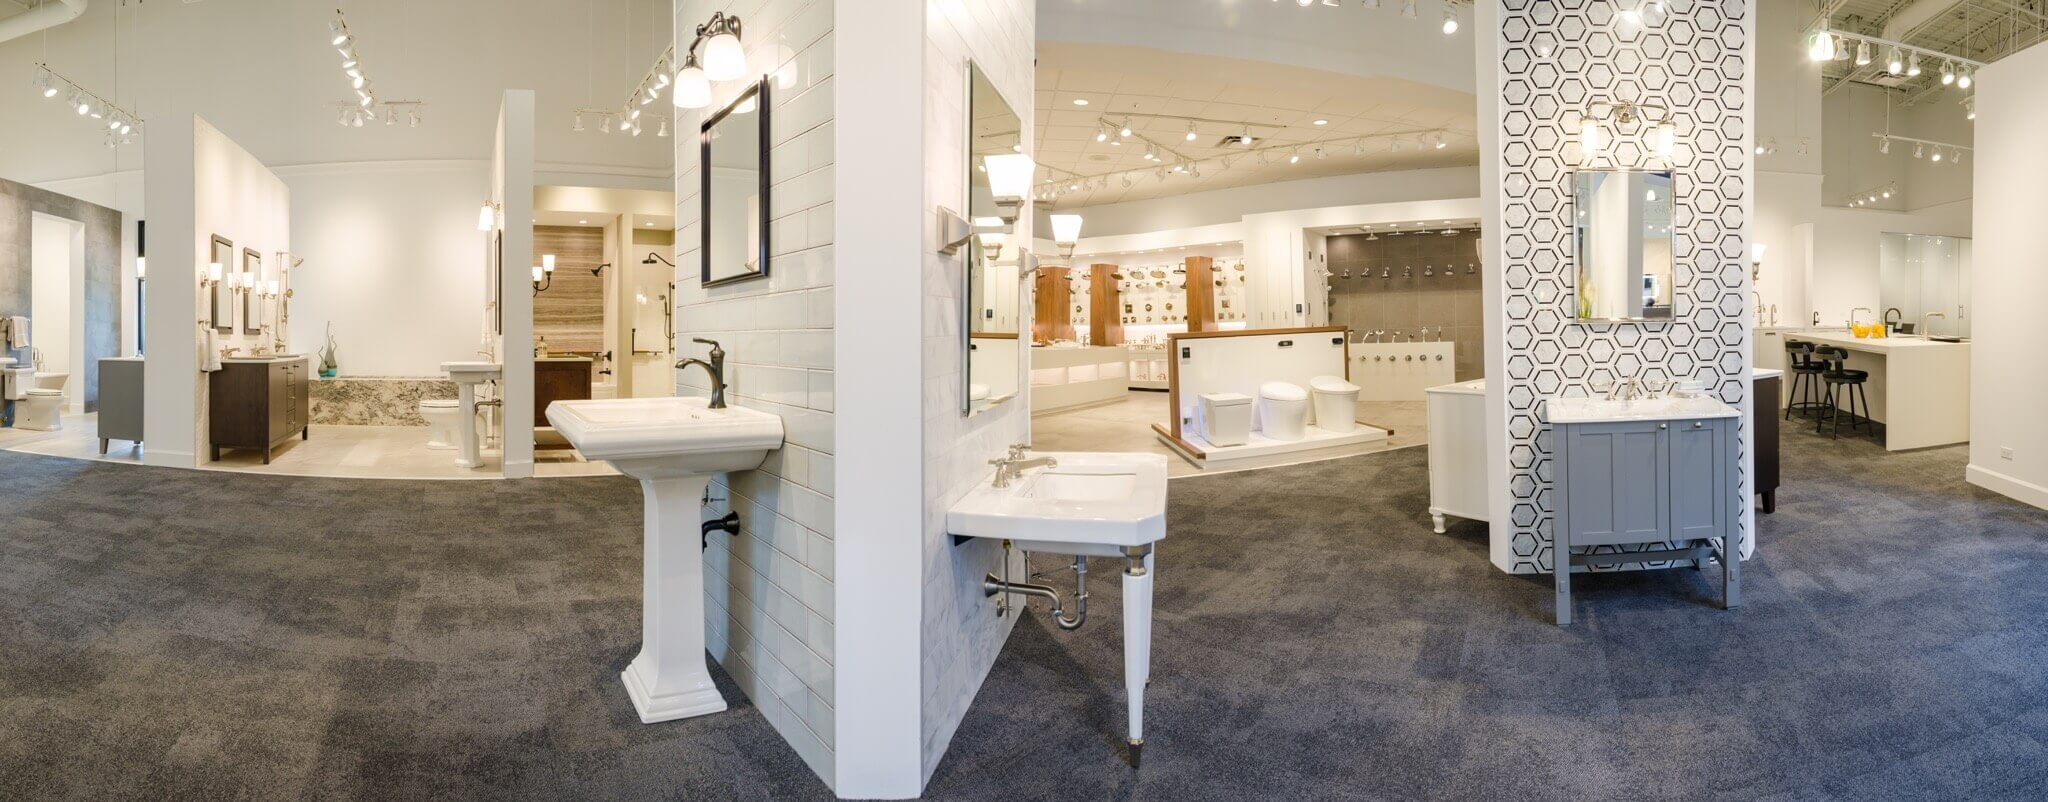 Superb Studio41 Home Design Showroom Locations Naperville Home Remodeling Inspirations Genioncuboardxyz